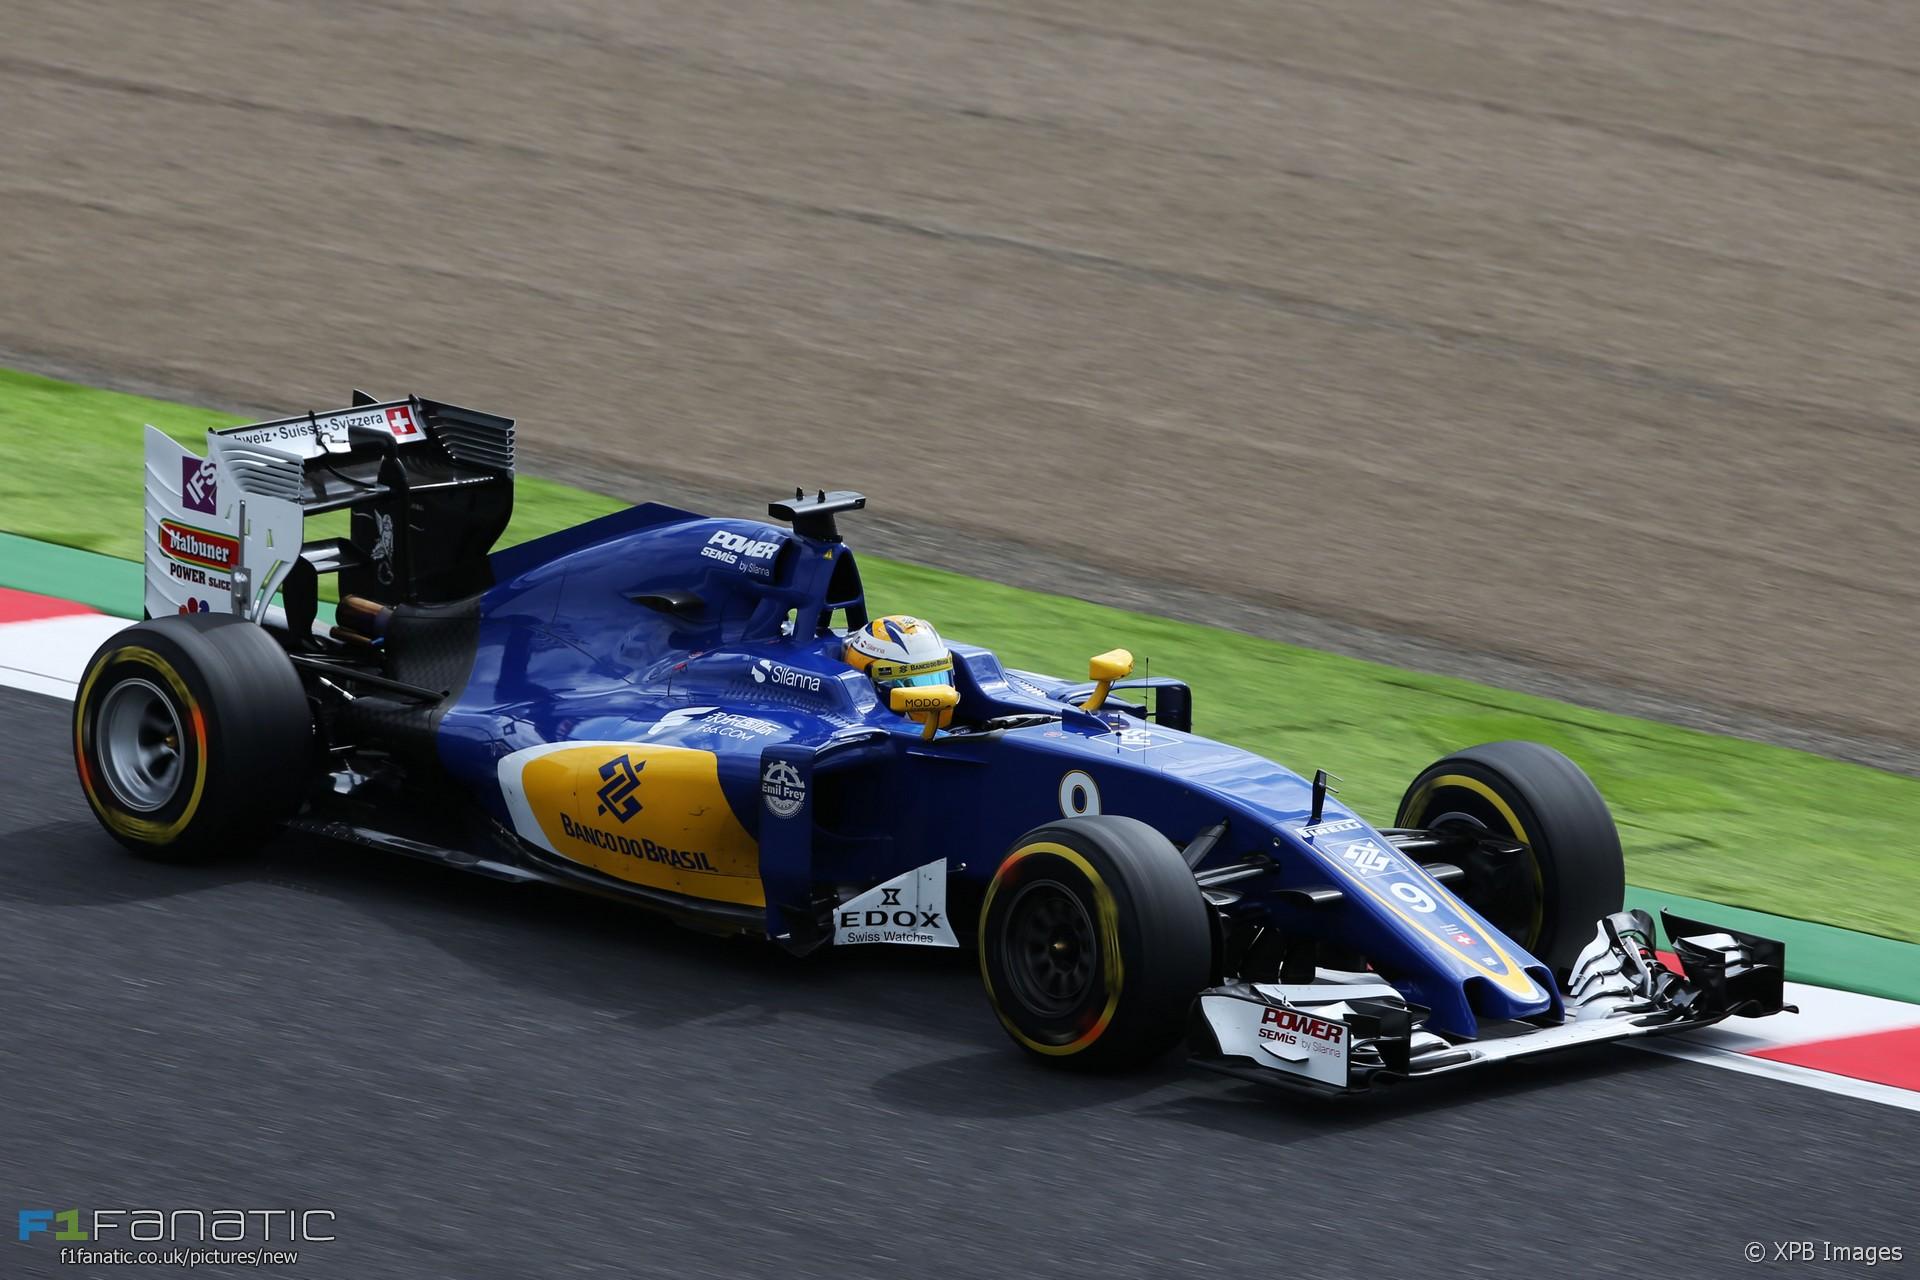 Marcus Ericsson, Sauber, Suzuka, 2016 · F1 Fanatic